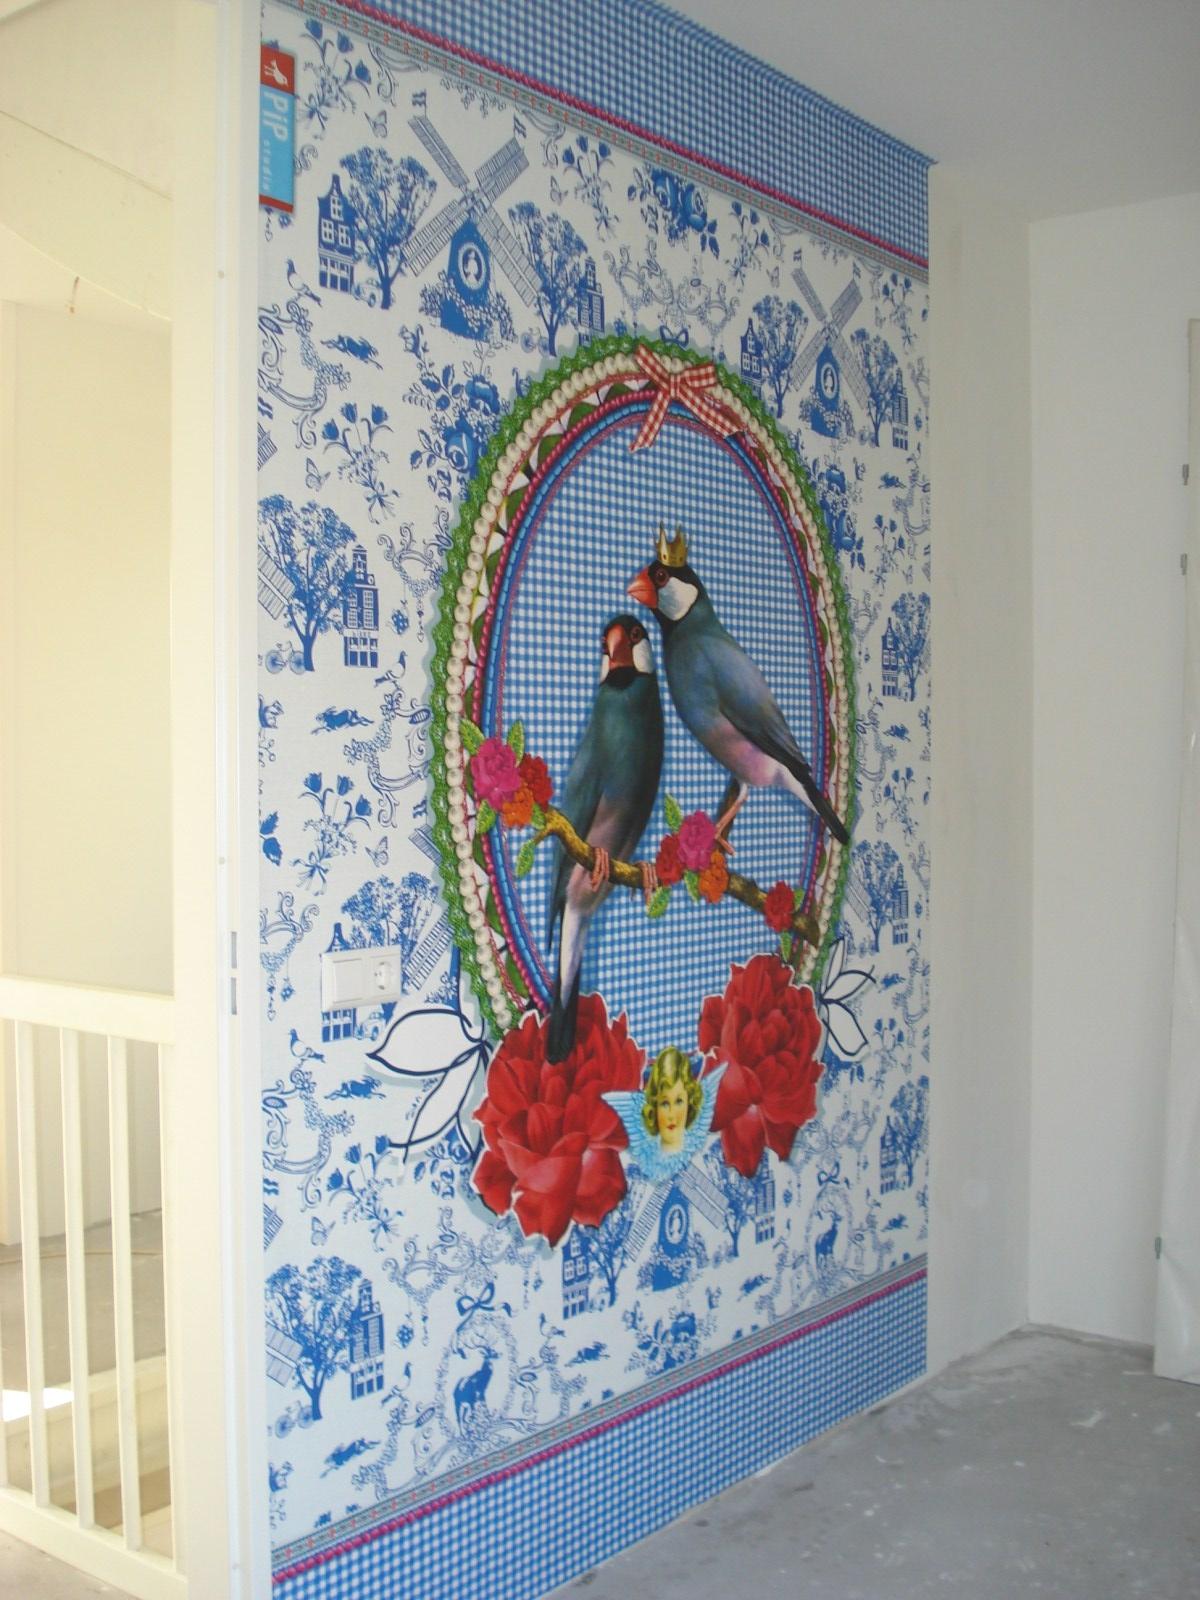 1000 images about home inspiration on pinterest pip. Black Bedroom Furniture Sets. Home Design Ideas